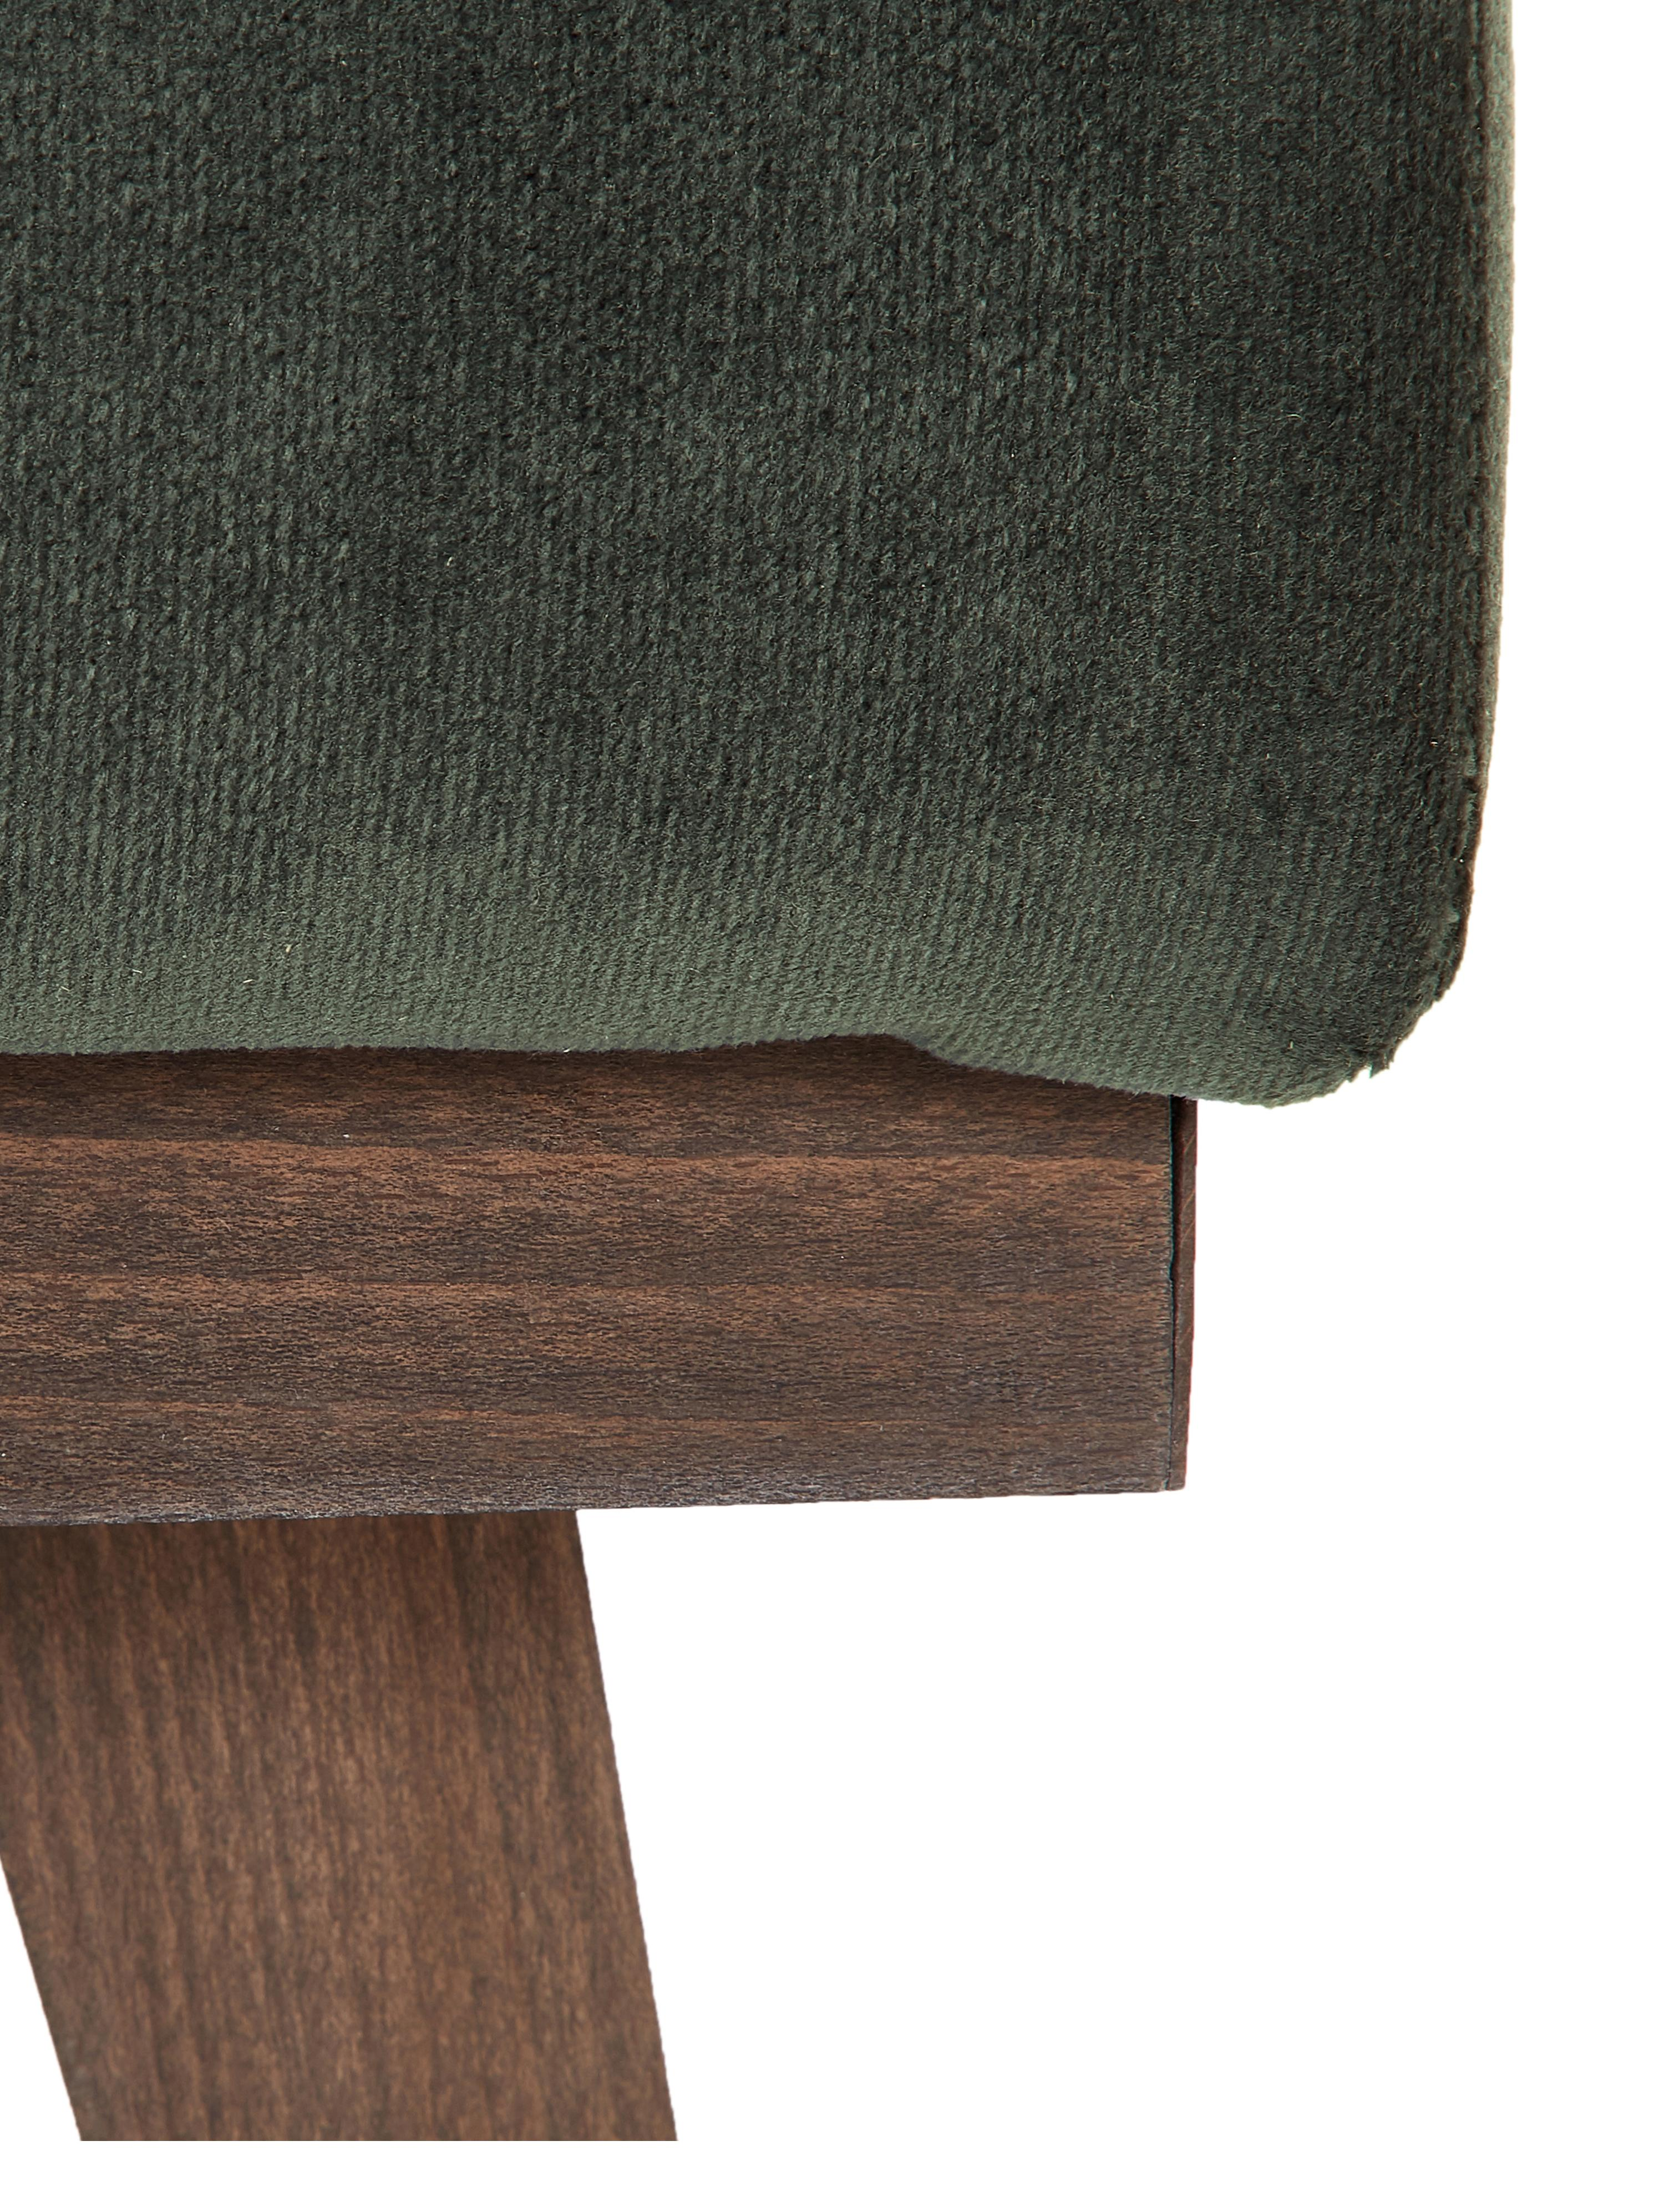 Reposapies de terciopelo Alva, Tapizado: terciopelo (tapizado de p, Estructura: madera de pino maciza, Patas: madera de haya curtida, Verde oliva, An 74 x Al 30 cm